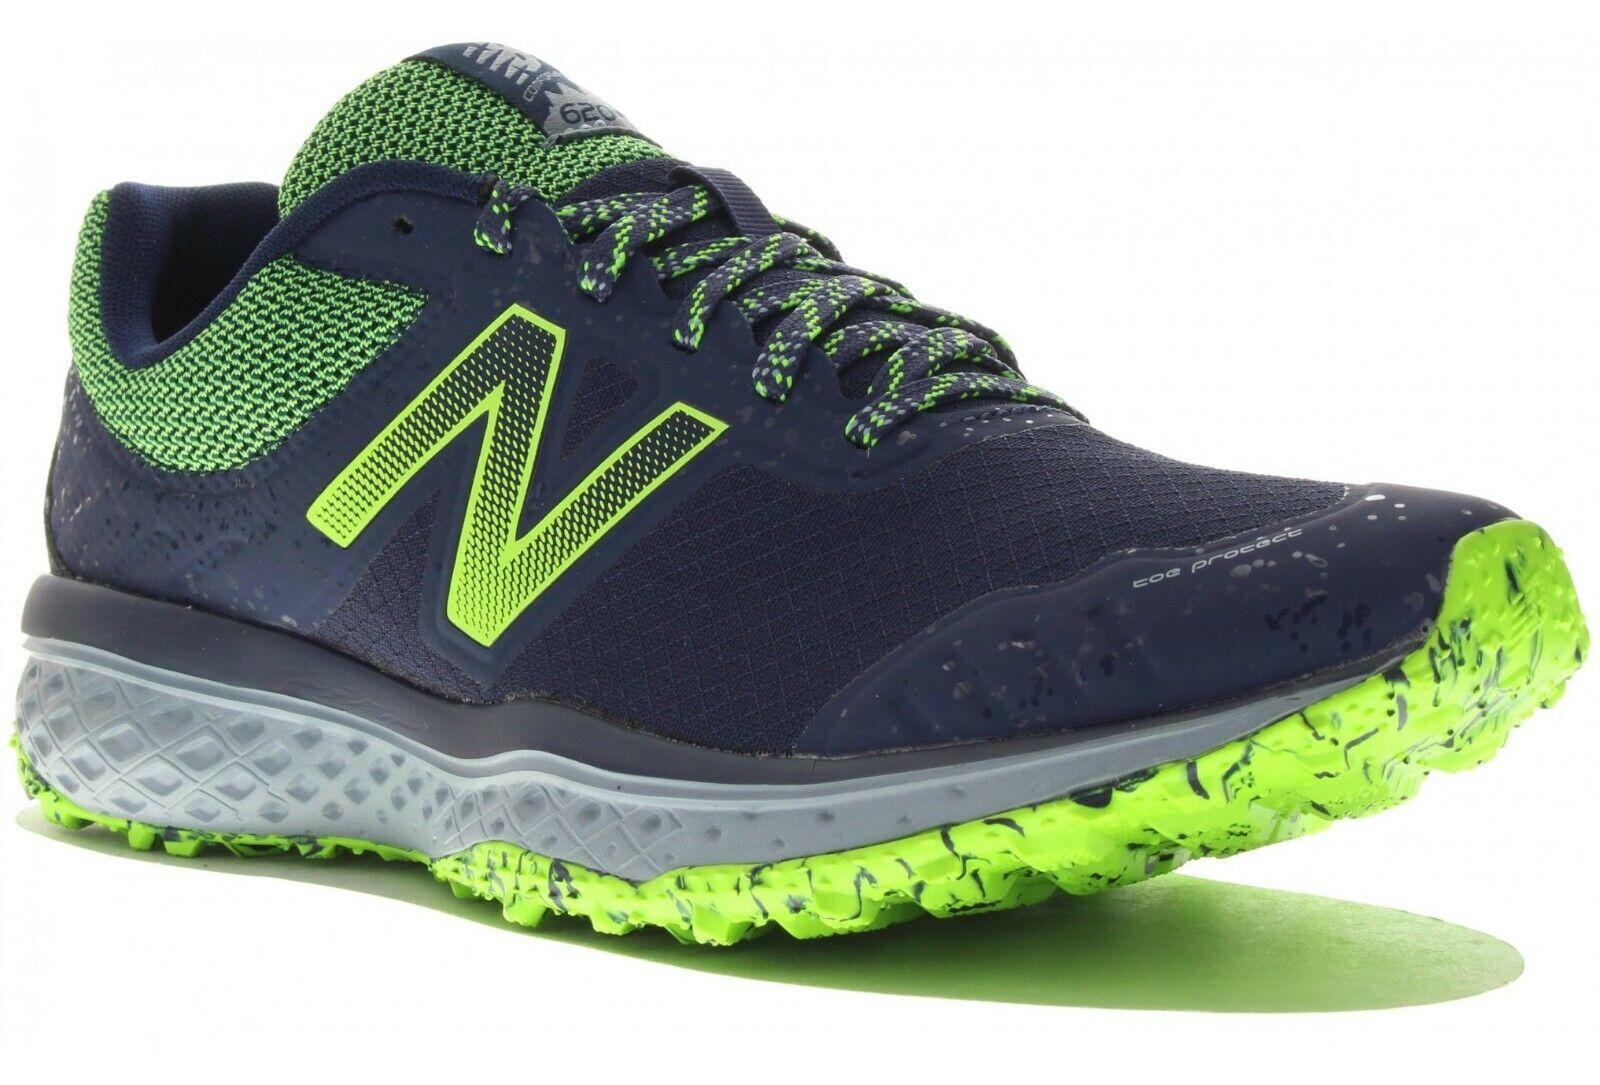 5f1aca2d84d37 New Balance 620v2 Mens Wide Trainers bluee Grey Trail Running shoes  MT620RN2. NEW BALANCE SNEAKERS 840 black grey BEIGE ML840GRA ADIDAS ...